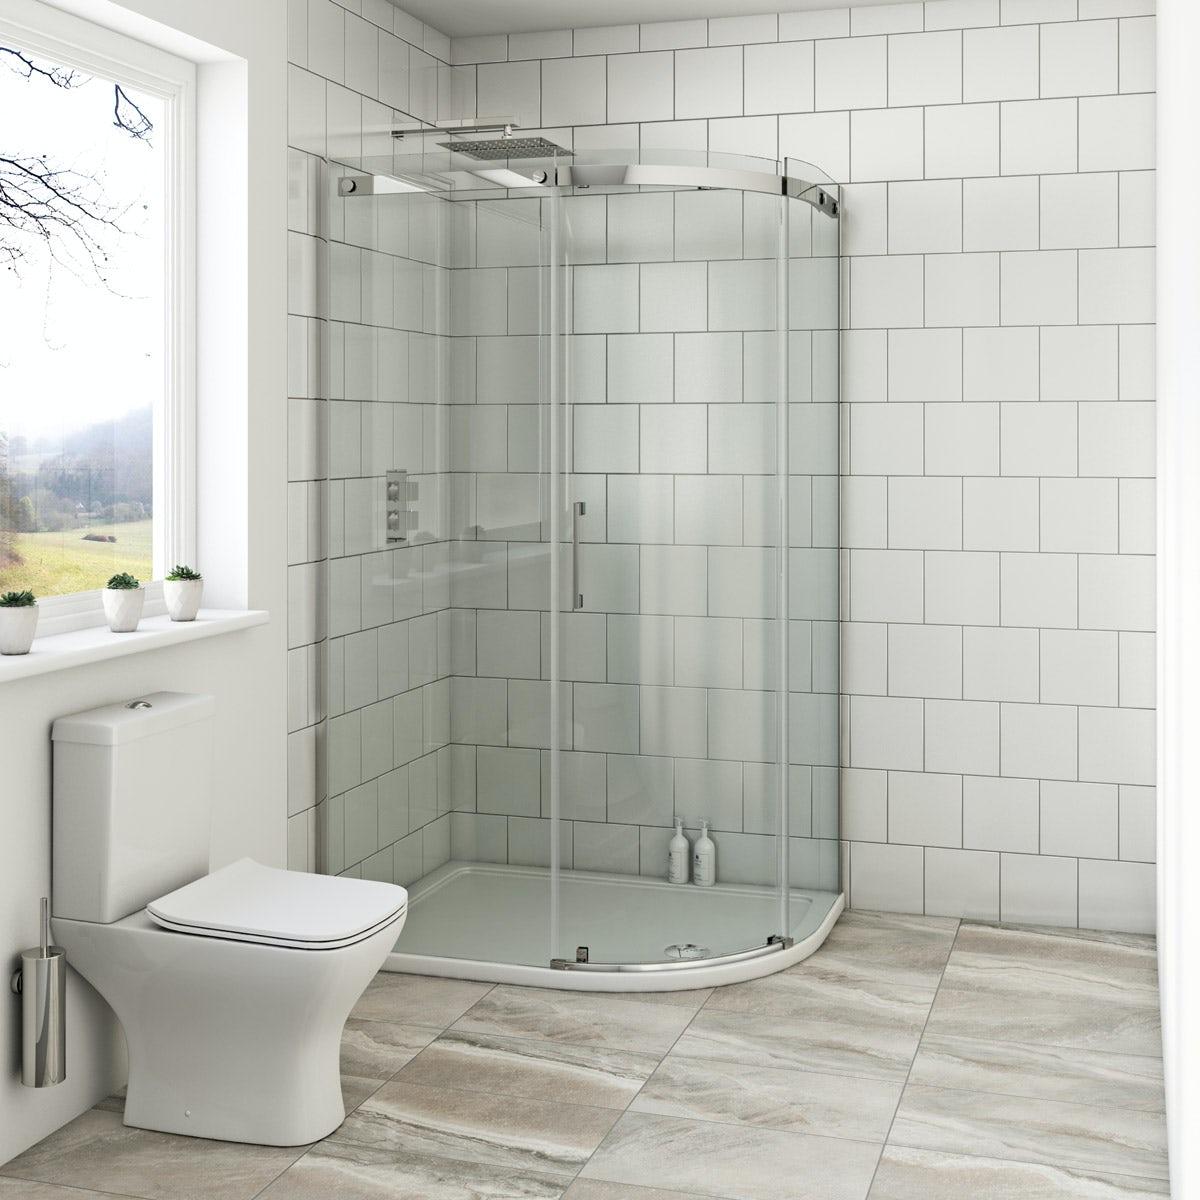 Mode Harrison 8mm right handed offset quadrant shower enclosure